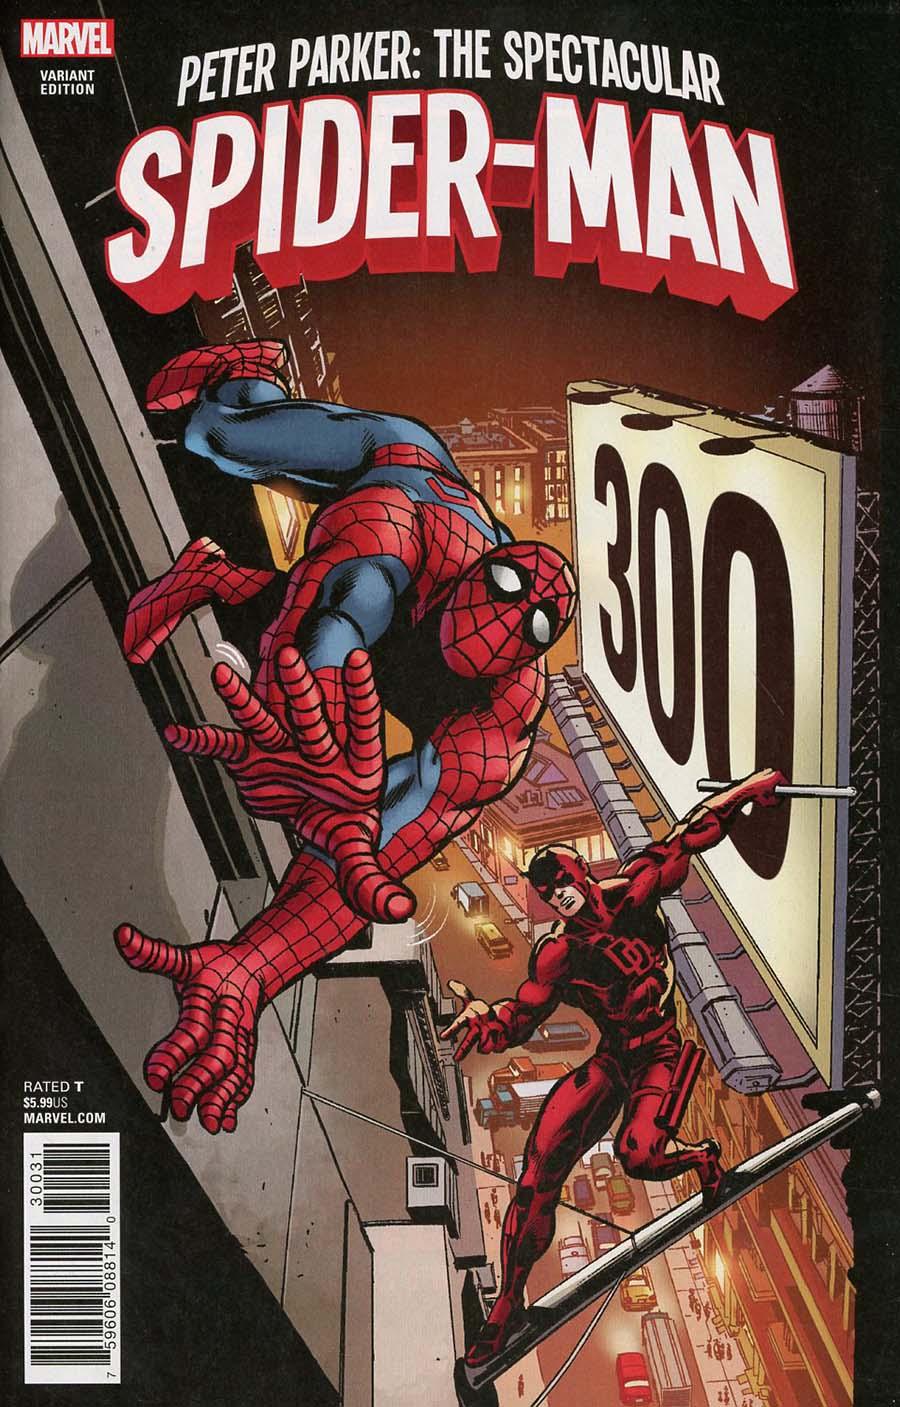 Peter Parker Spectacular Spider-Man #300 Cover G Incentive Frank Miller Remastered Color Variant Cover (Marvel Legacy Tie-In)